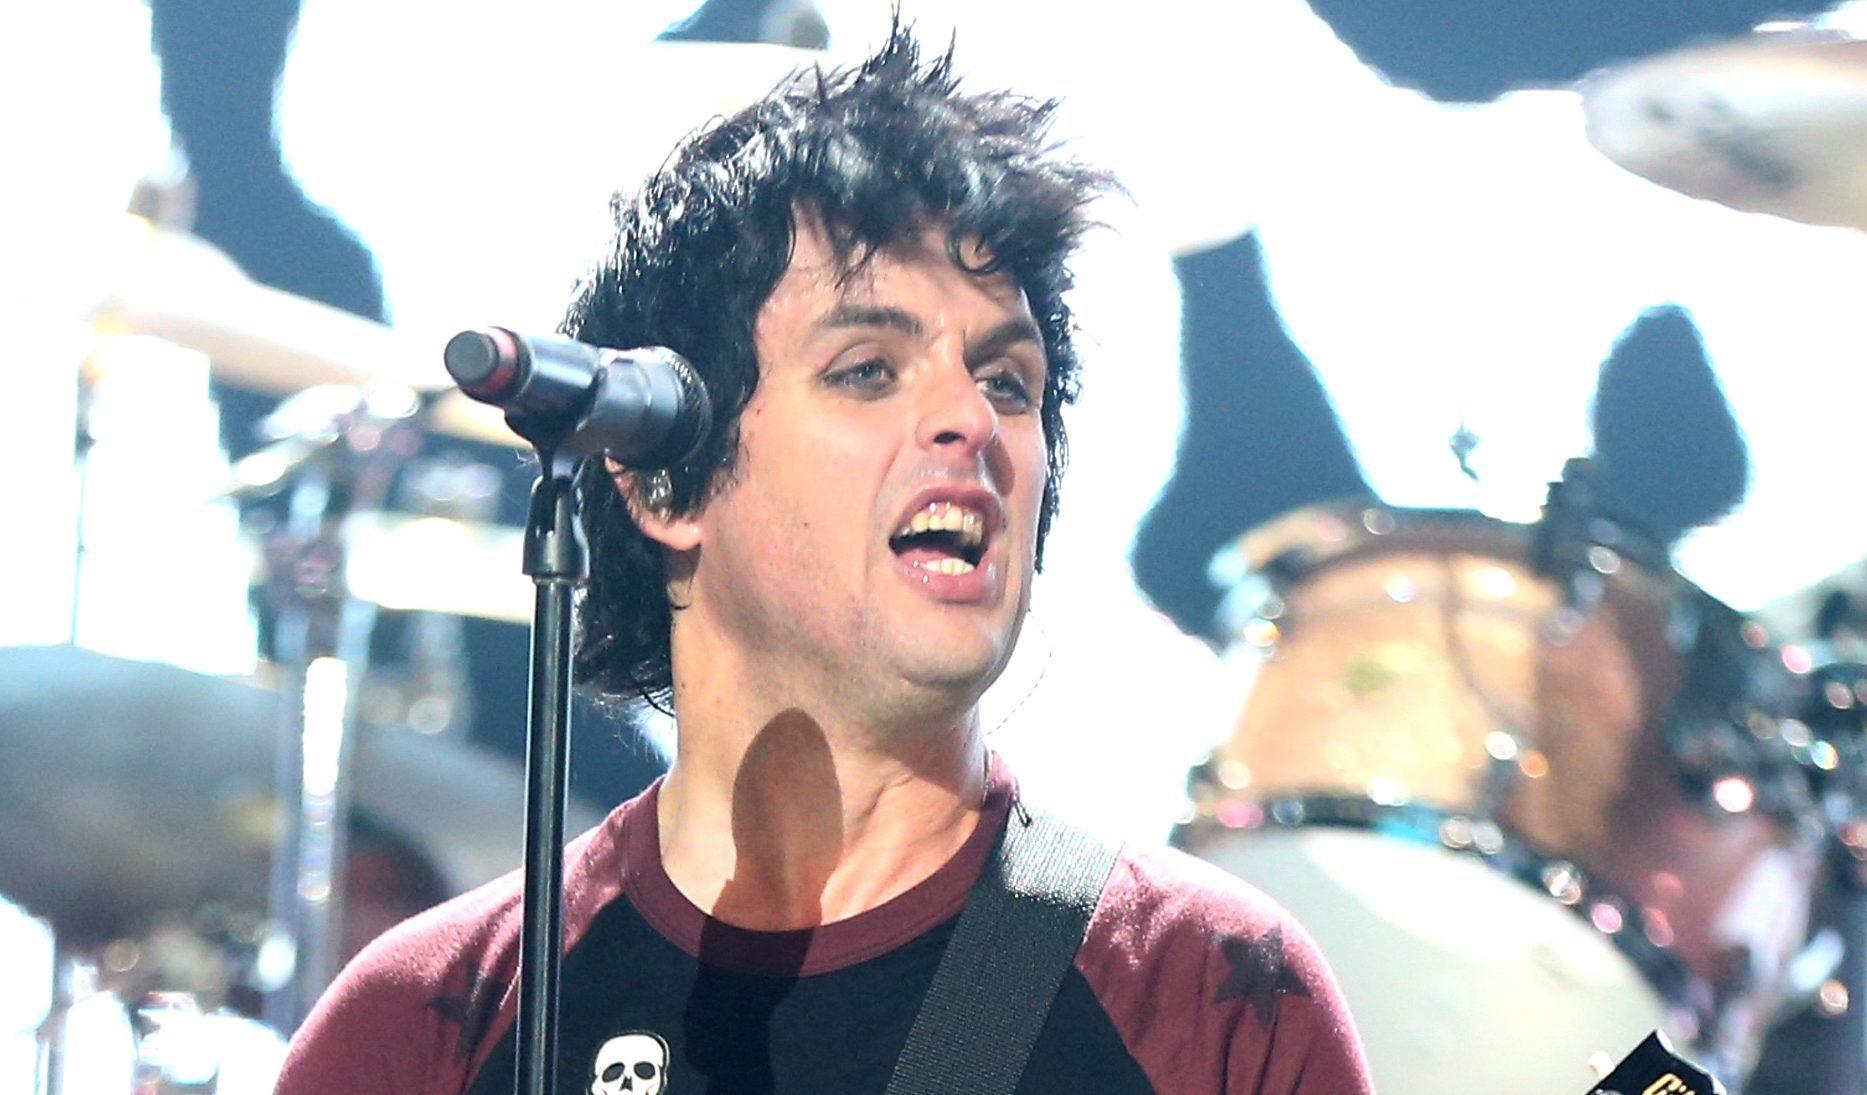 Billie Joe Armstrong of Green Day.